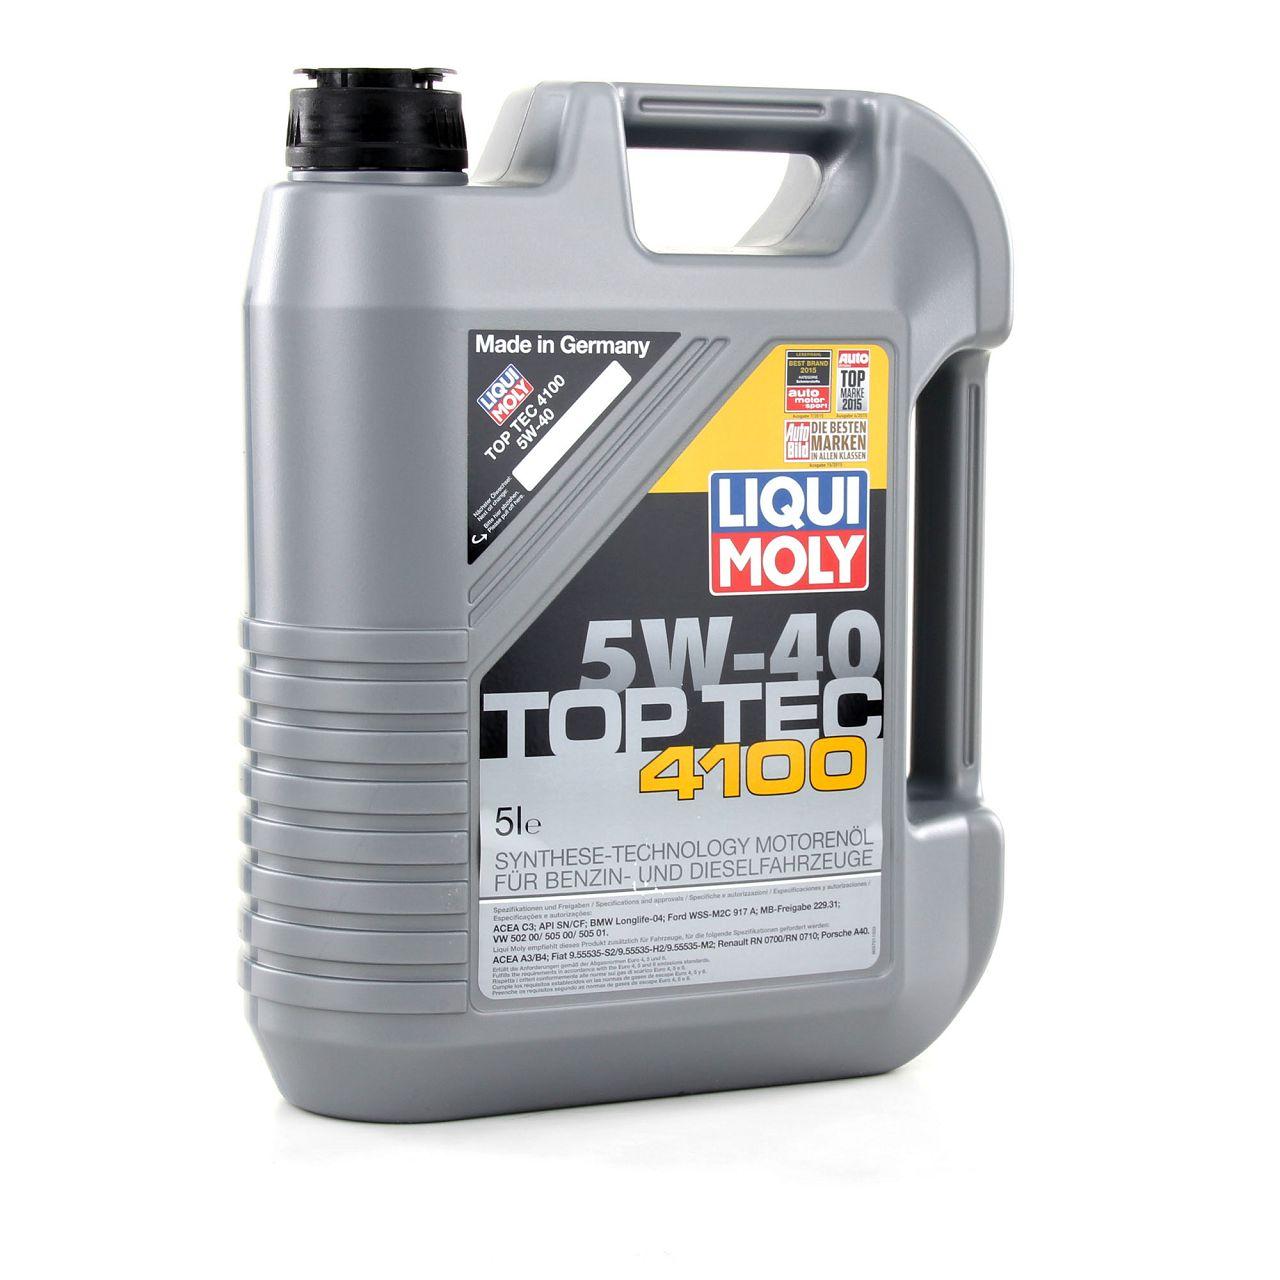 LIQUI MOLY Motoröl Öl TOP TEC 4100 5W40 5W-40 5L 5Liter 3701